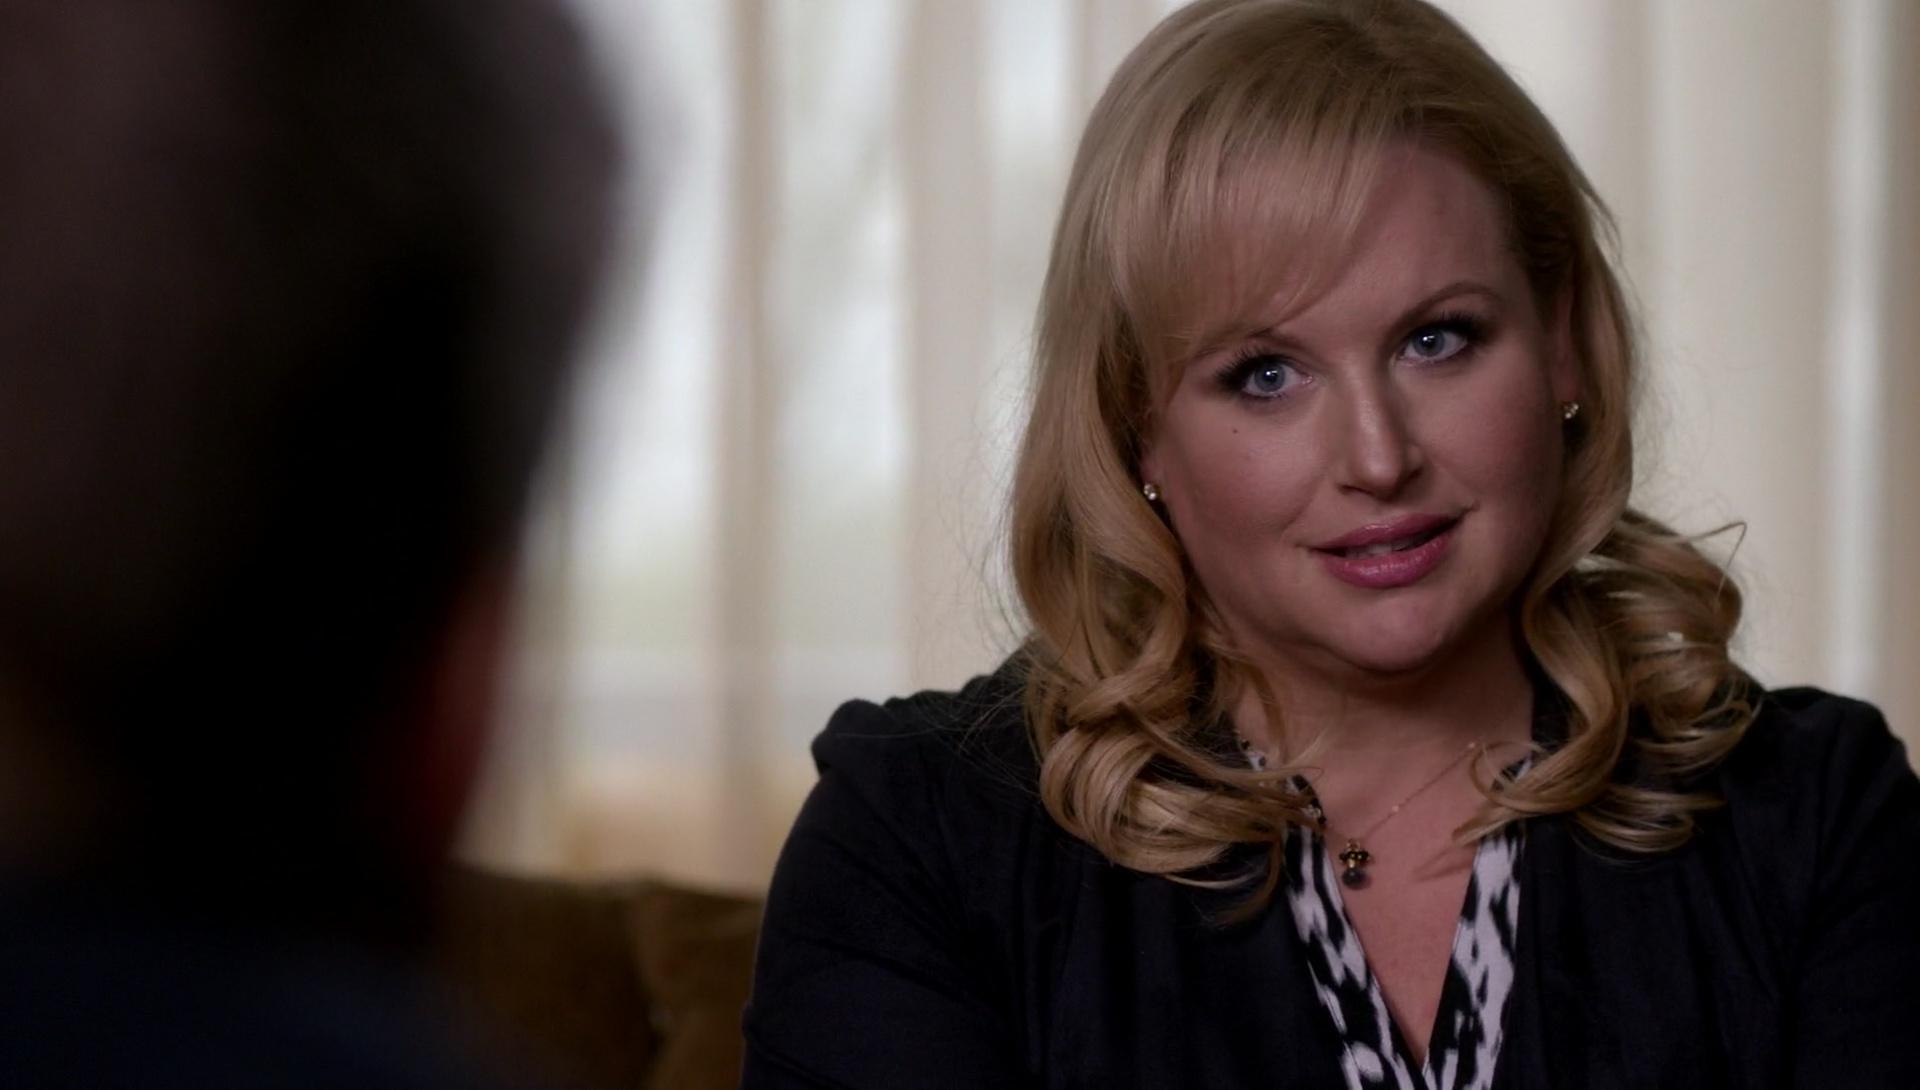 Lillian Garrett-Groag,Sarah Rice Adult clips Elizabeth Hendrickson born July 3, 1979 (age 39),Beatrice Burnham